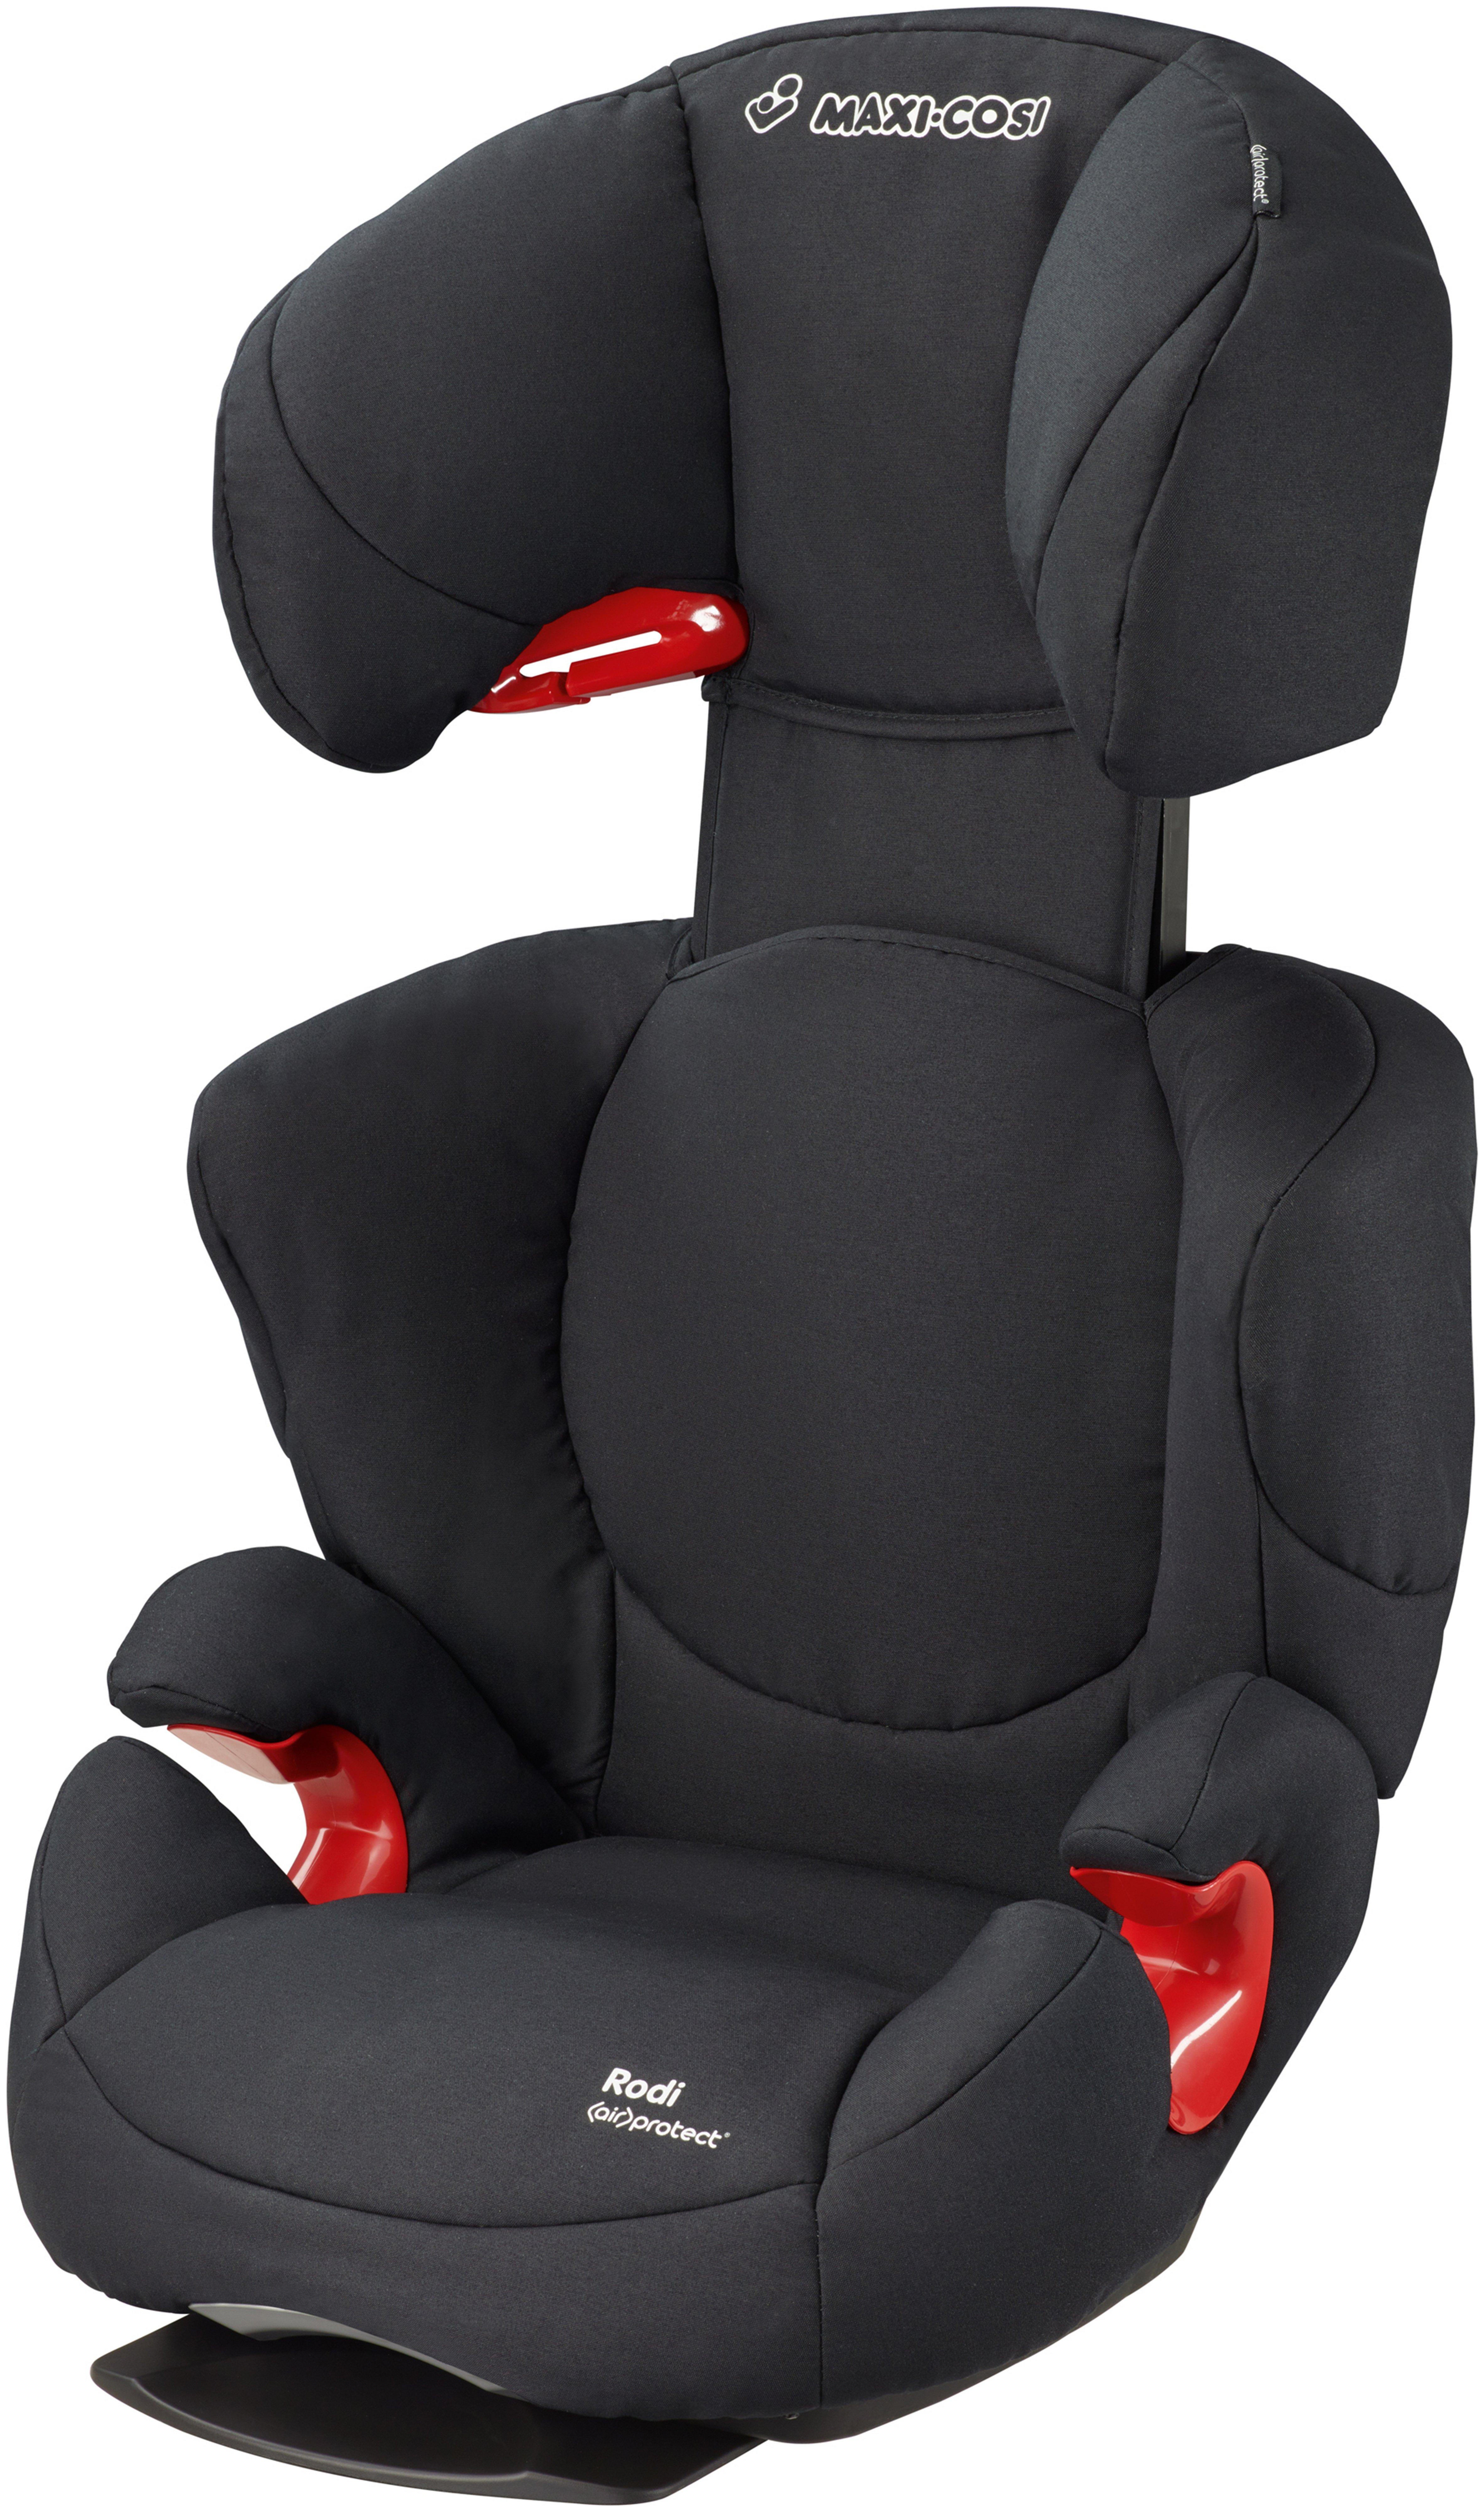 8712930092766 ean maxi cosi rodi air protect car seat black upc lookup. Black Bedroom Furniture Sets. Home Design Ideas